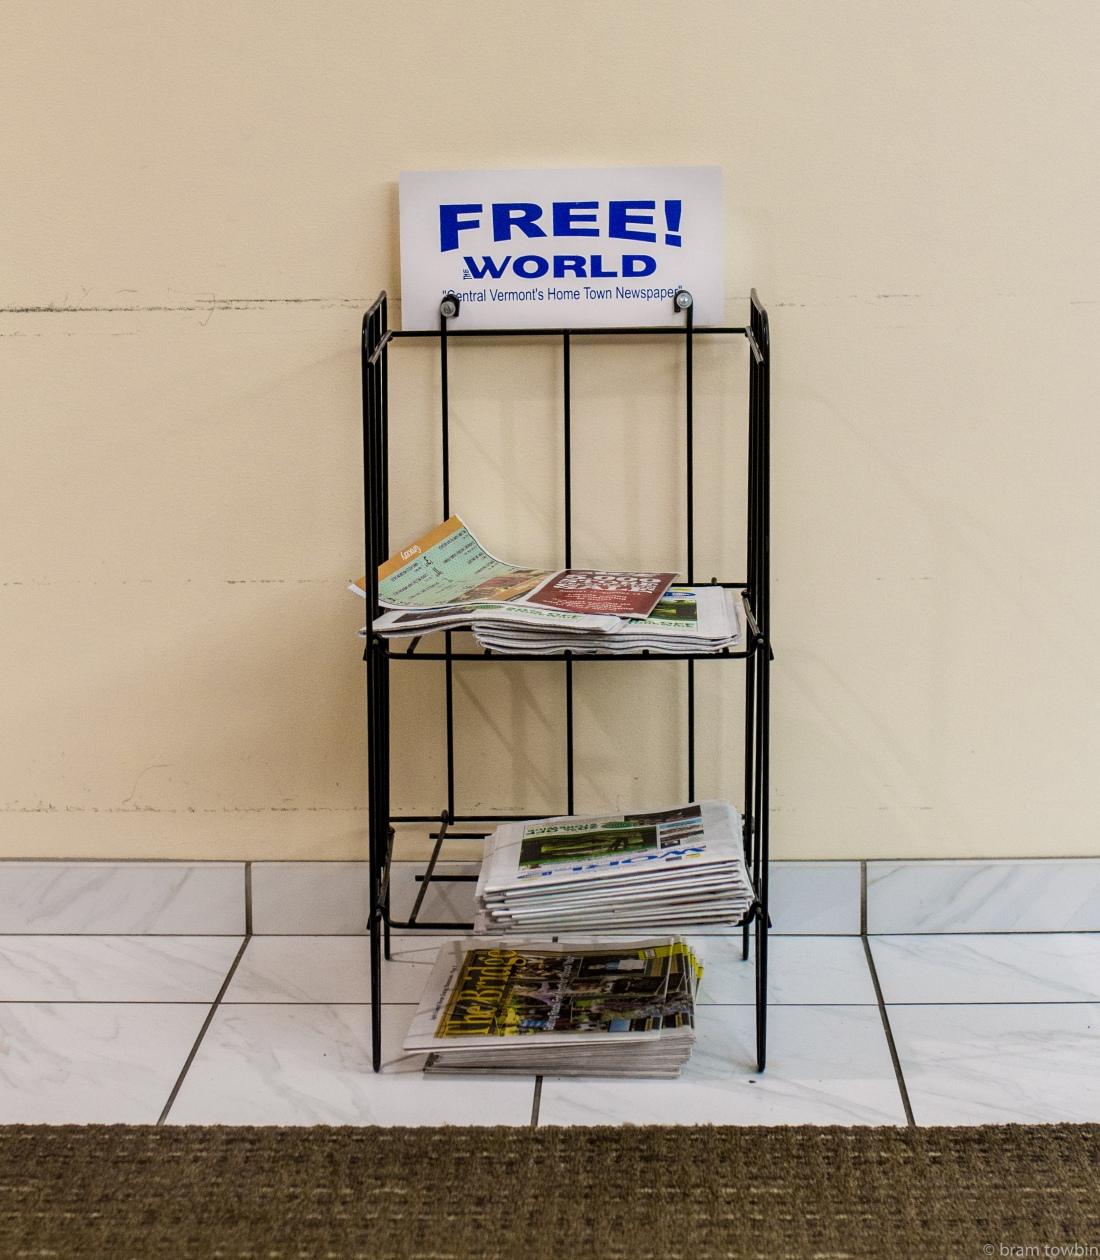 world newspaper stand.jpg